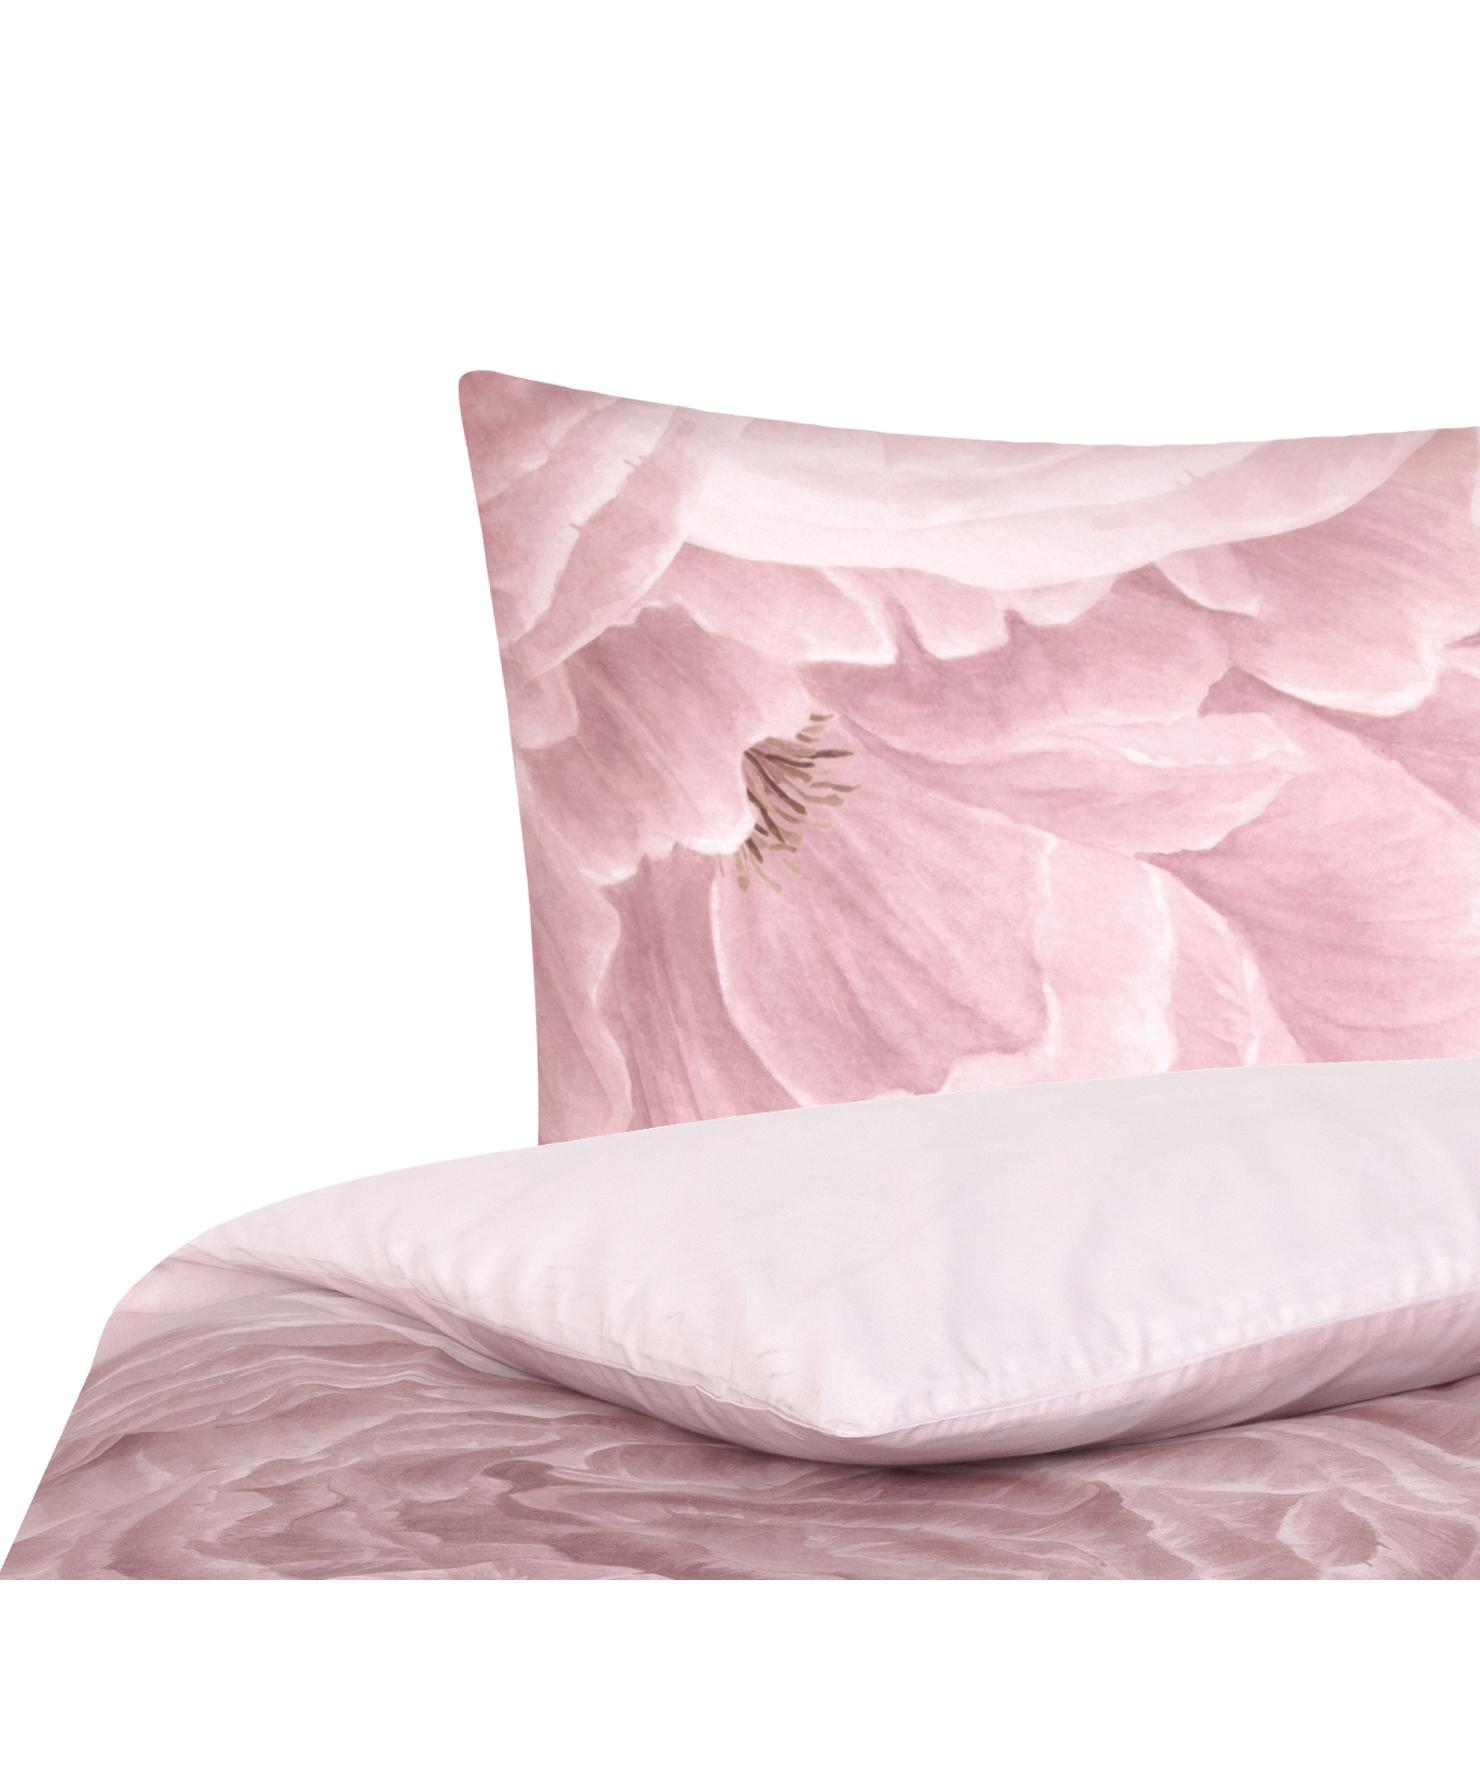 Baumwollperkal-Bettwäsche Rosario mit Aquarell Blumen-Print, Webart: Perkal Fadendichte 210 TC, Weiß, Rosa, 135 x 200 cm + 1 Kissen 80 x 80 cm